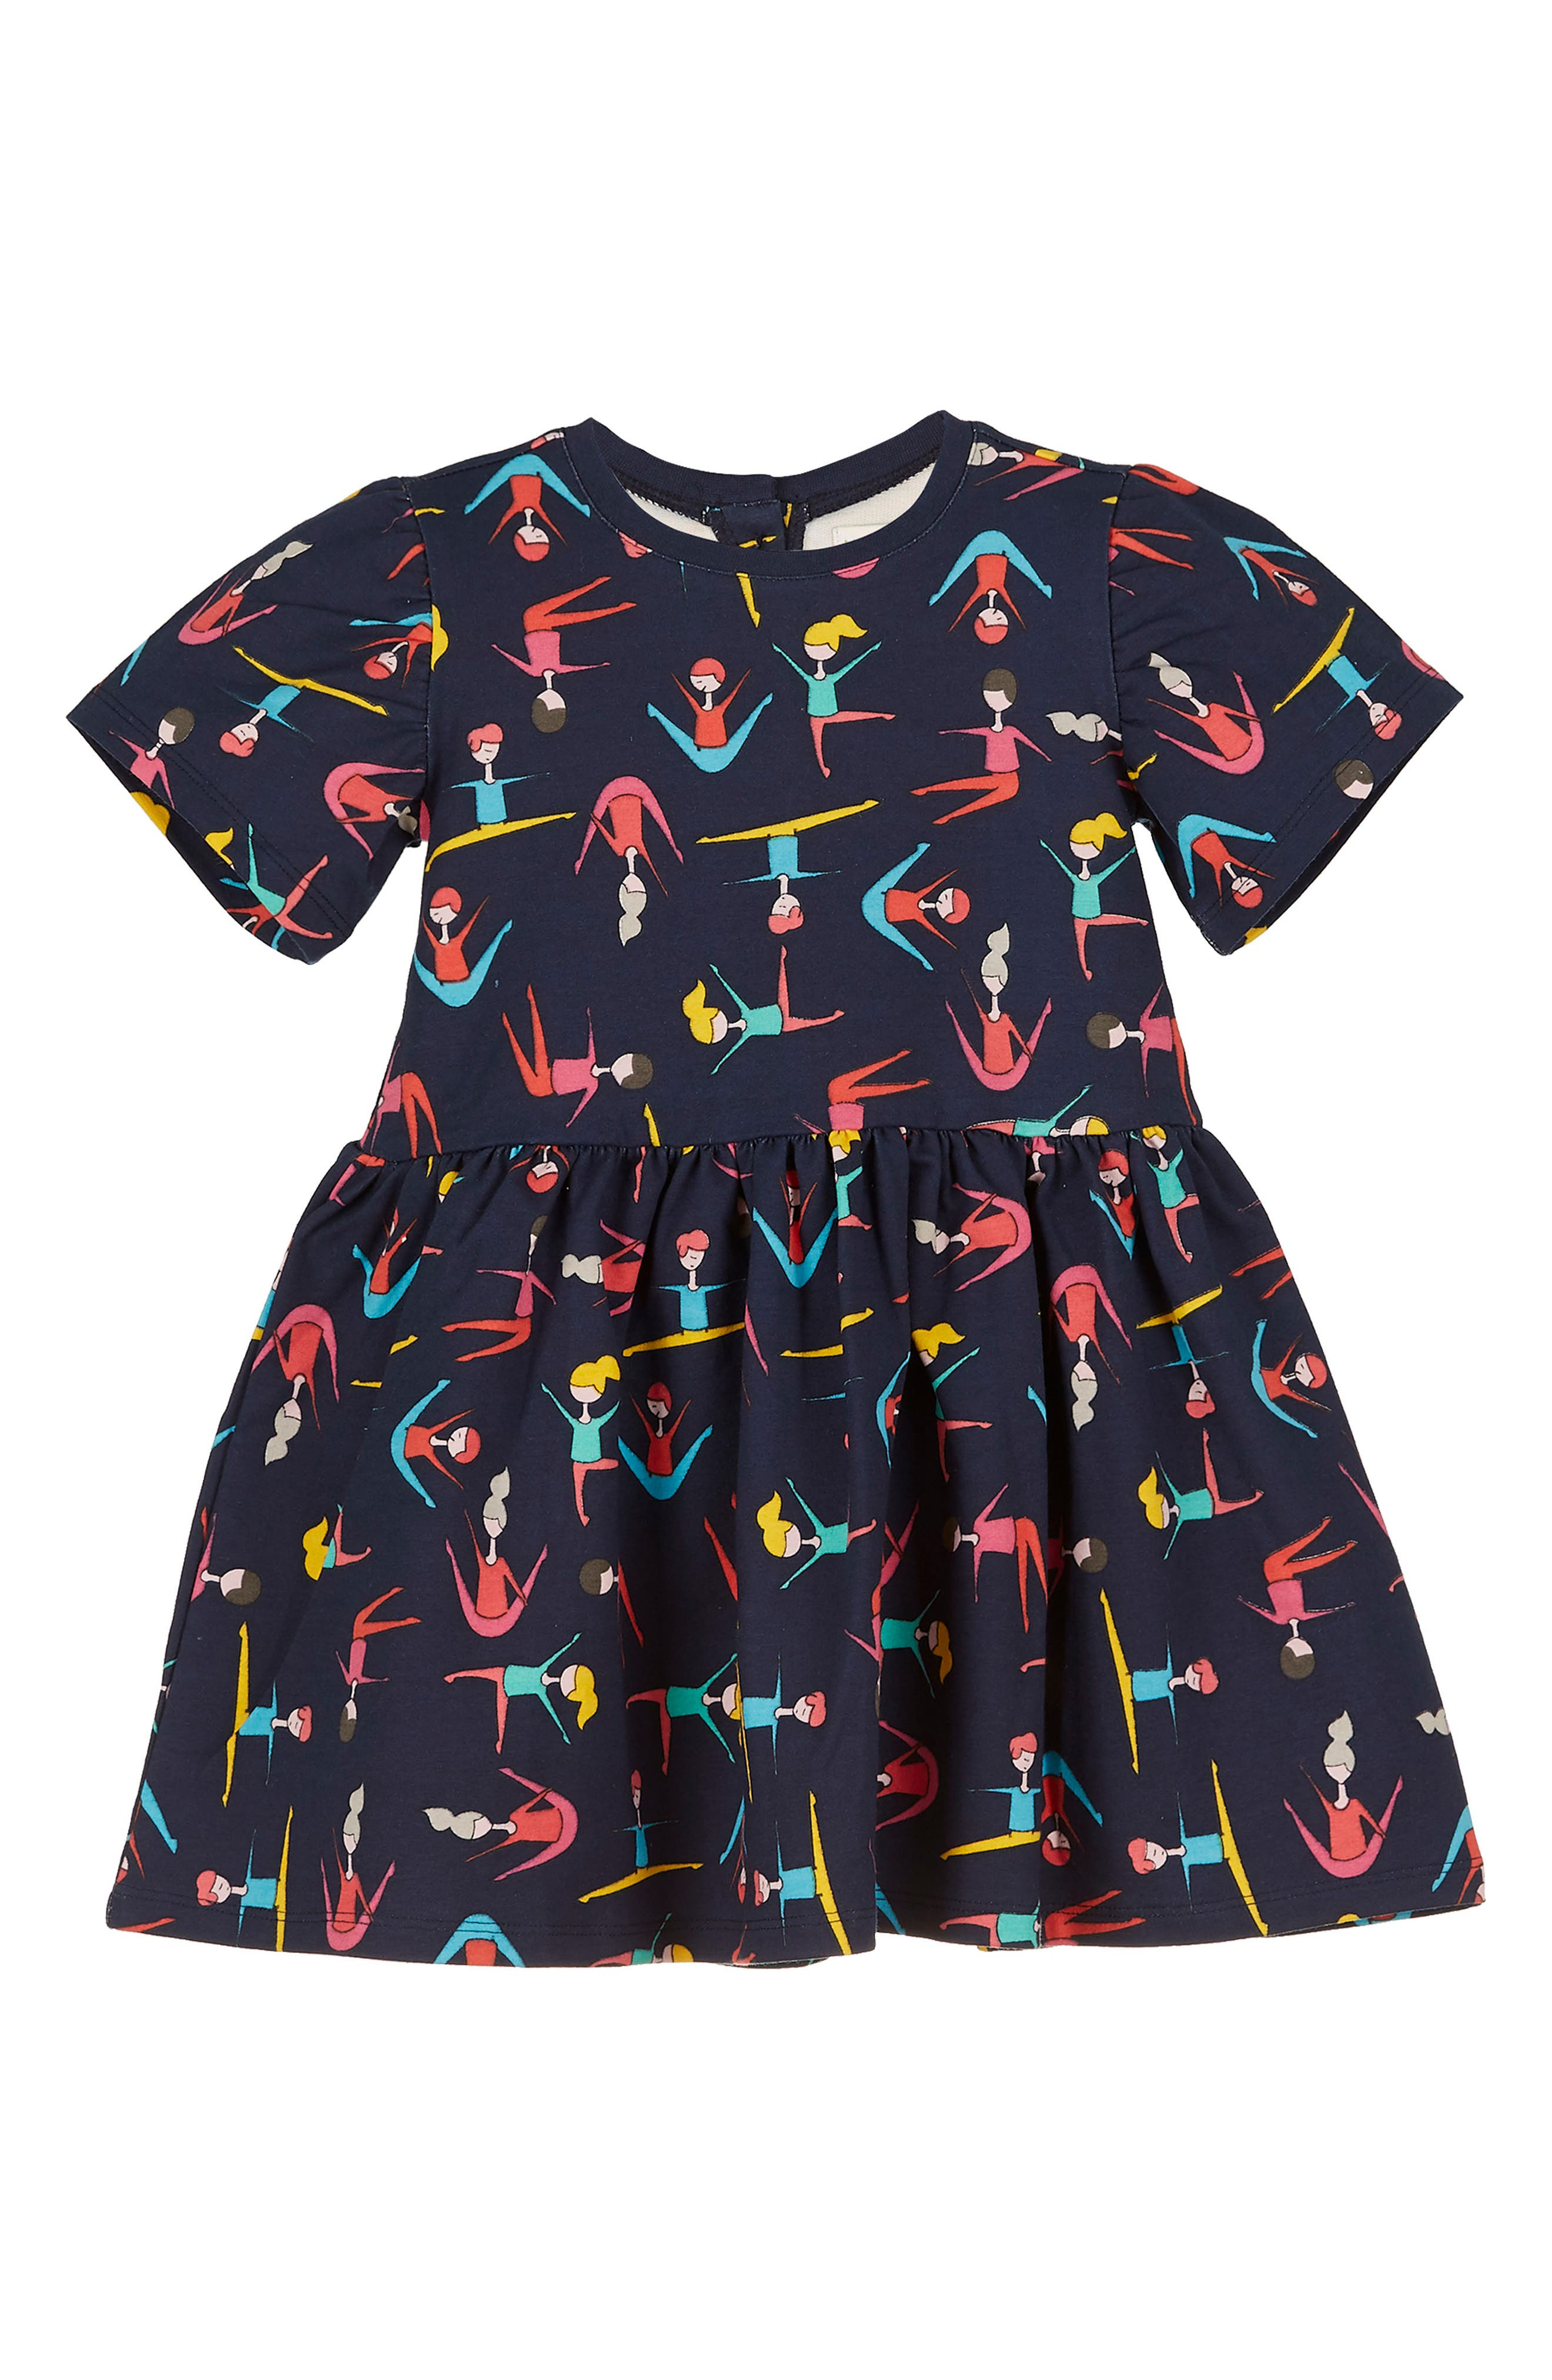 Stretching Print Dress,                             Main thumbnail 1, color,                             Black Multi